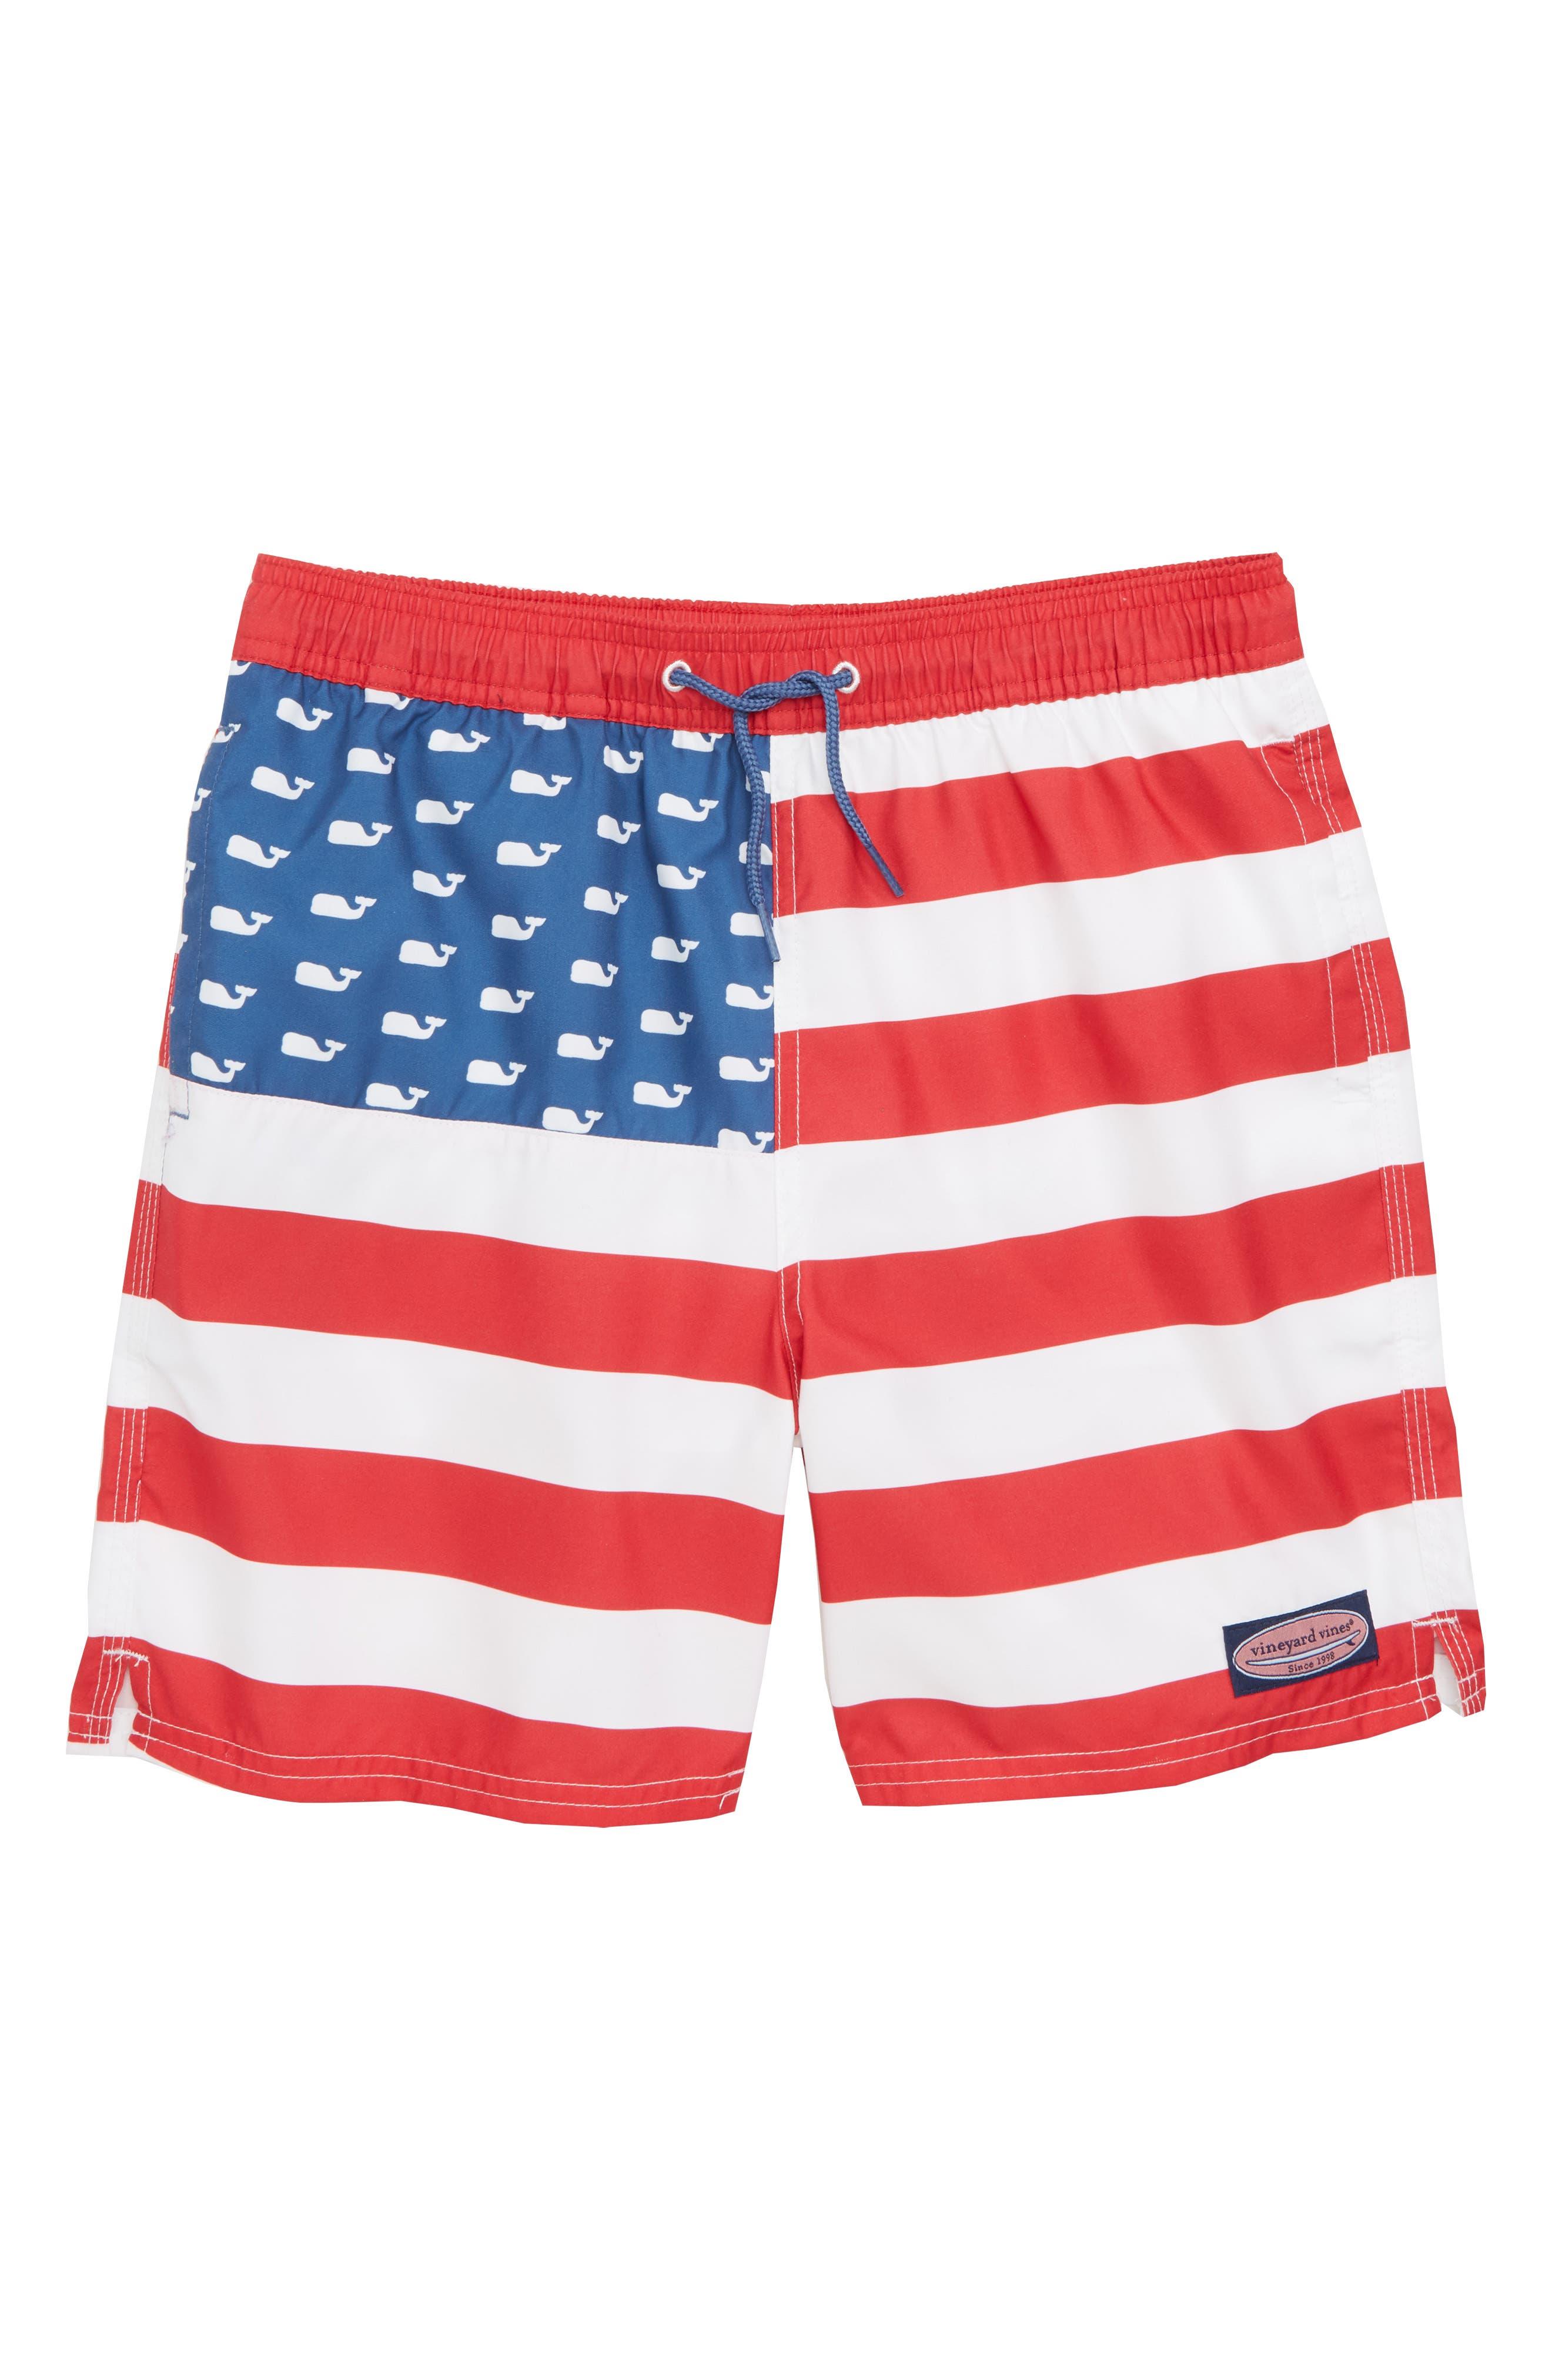 VINEYARD VINES Chappy USA Flag Swim Trunks, Main, color, 461